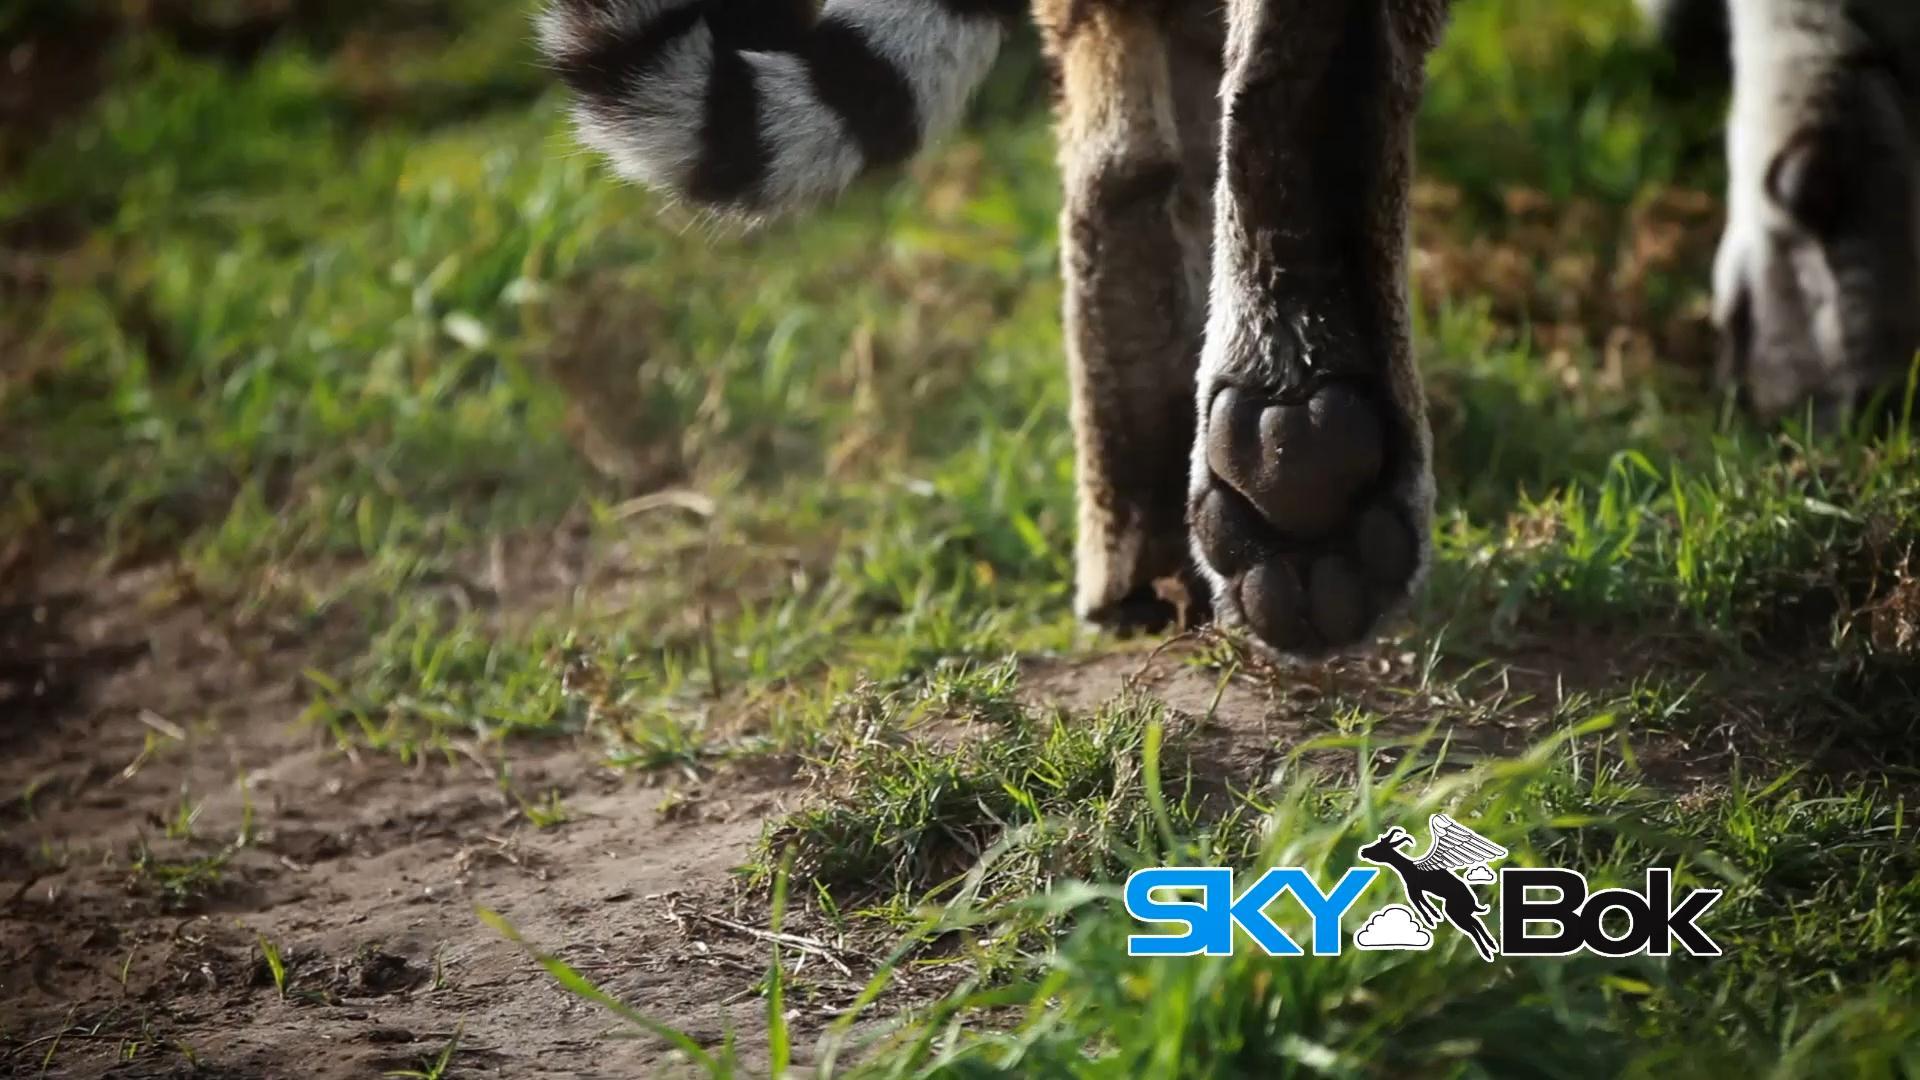 Seaview Lion Park Port Elizabeth Skybok Video Profiling South Africa